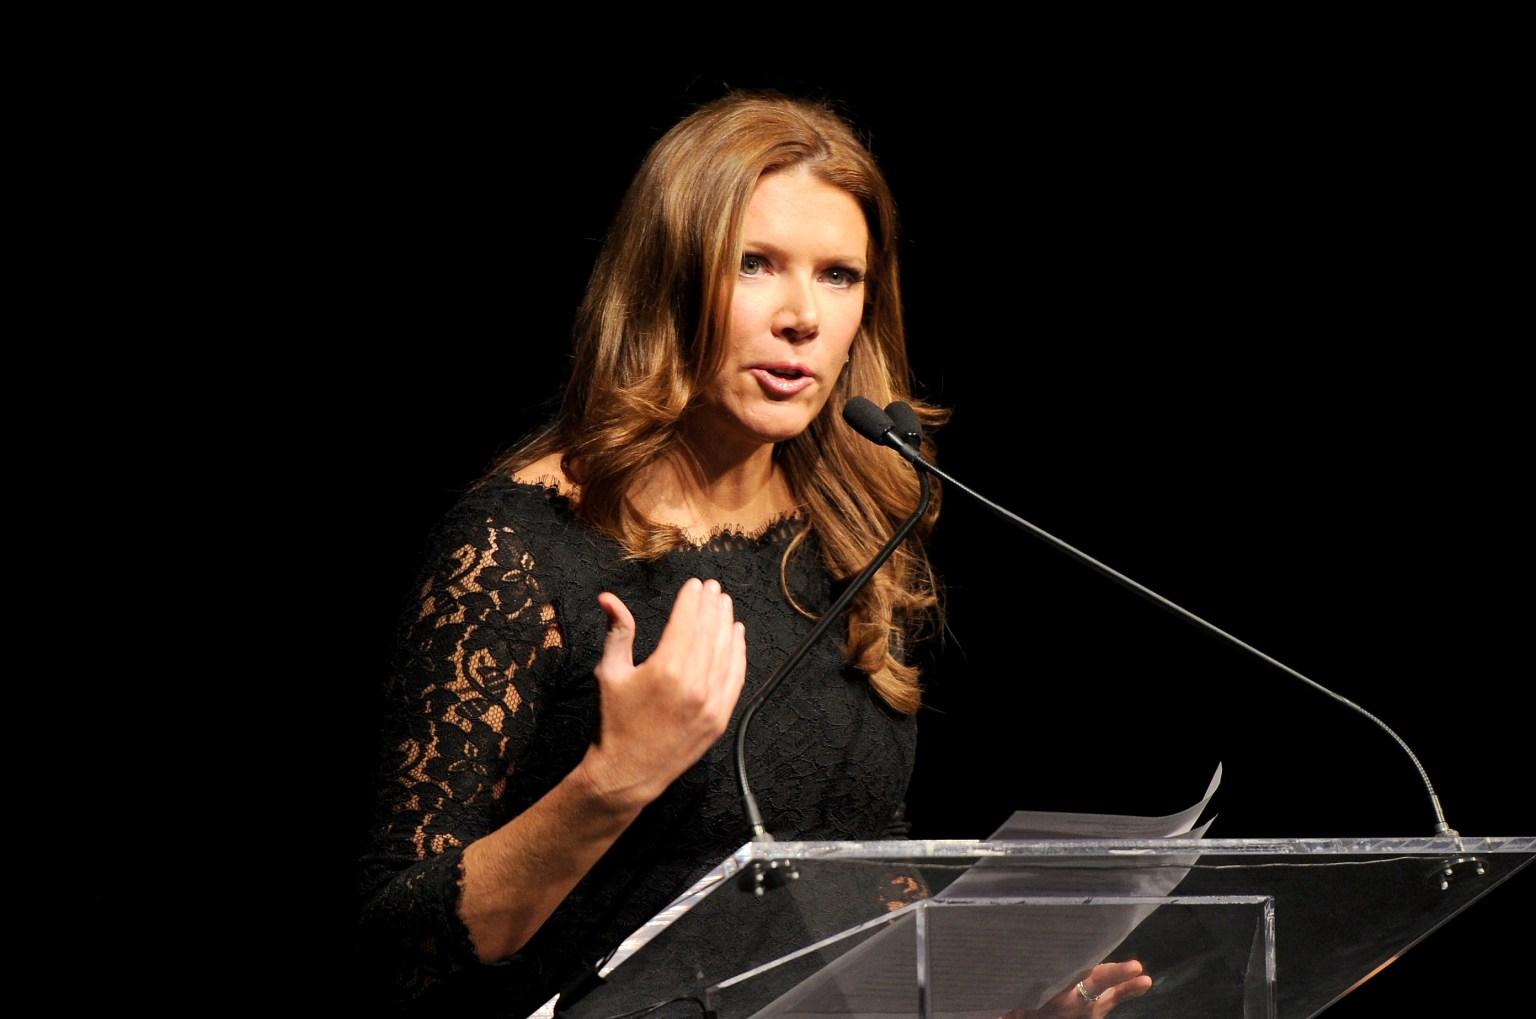 Fox Business parts ways with Trish Regan, host who dismissed coronavirus as 'impeachment scam'